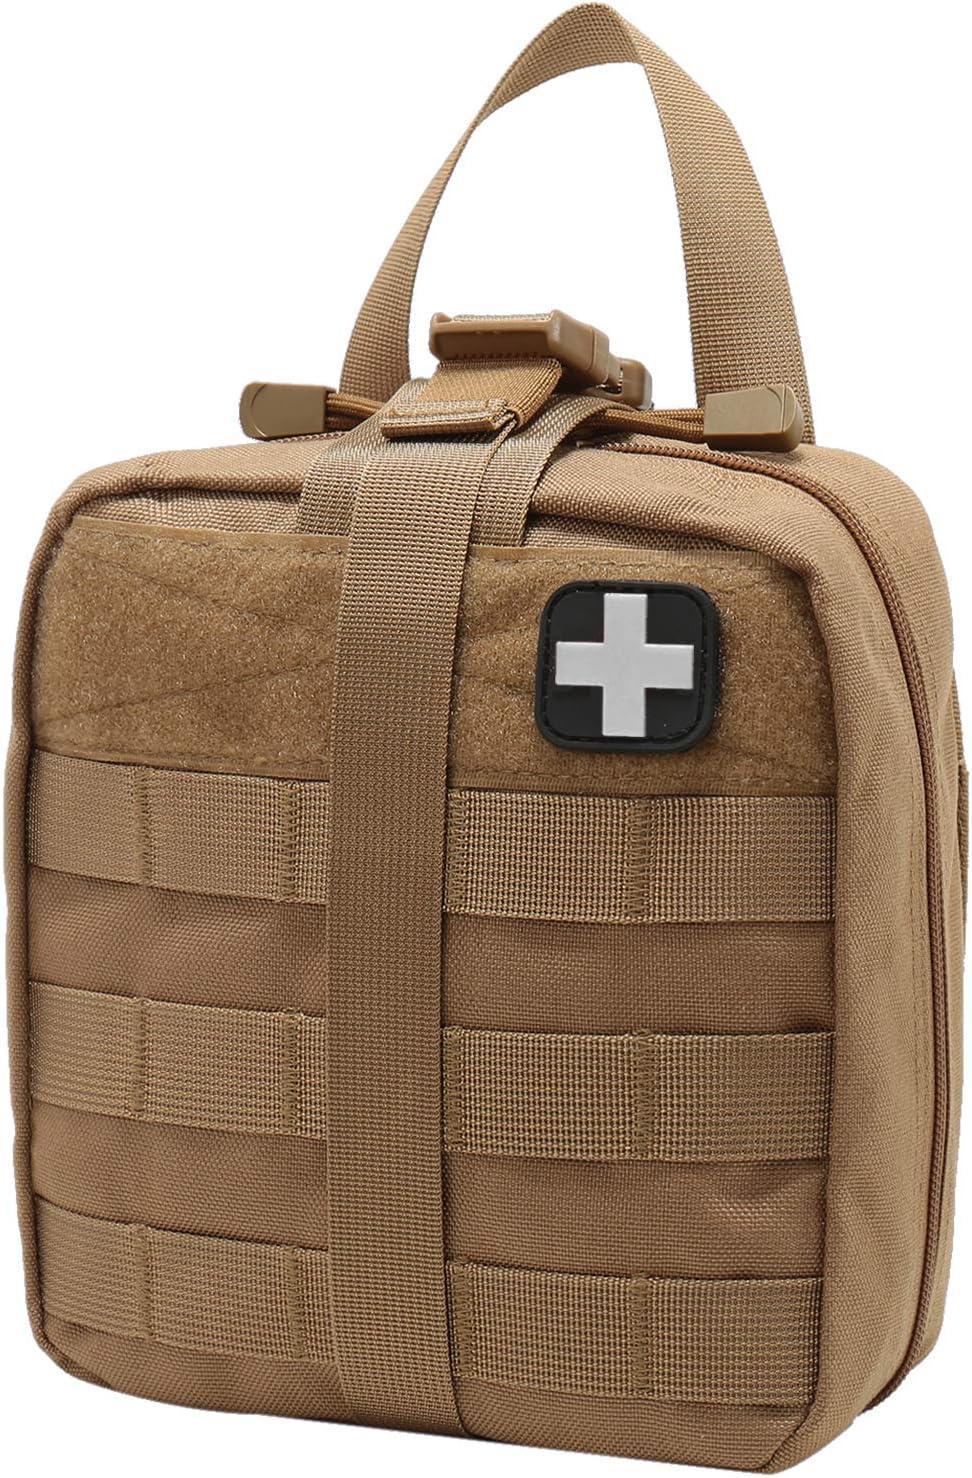 solo borsa Gonex MOLLE Medical Pouch EMT First Aid Pouch Rip-Away IFAK Tactical Utility Pouch per attivit/à allaperto forniture mediche